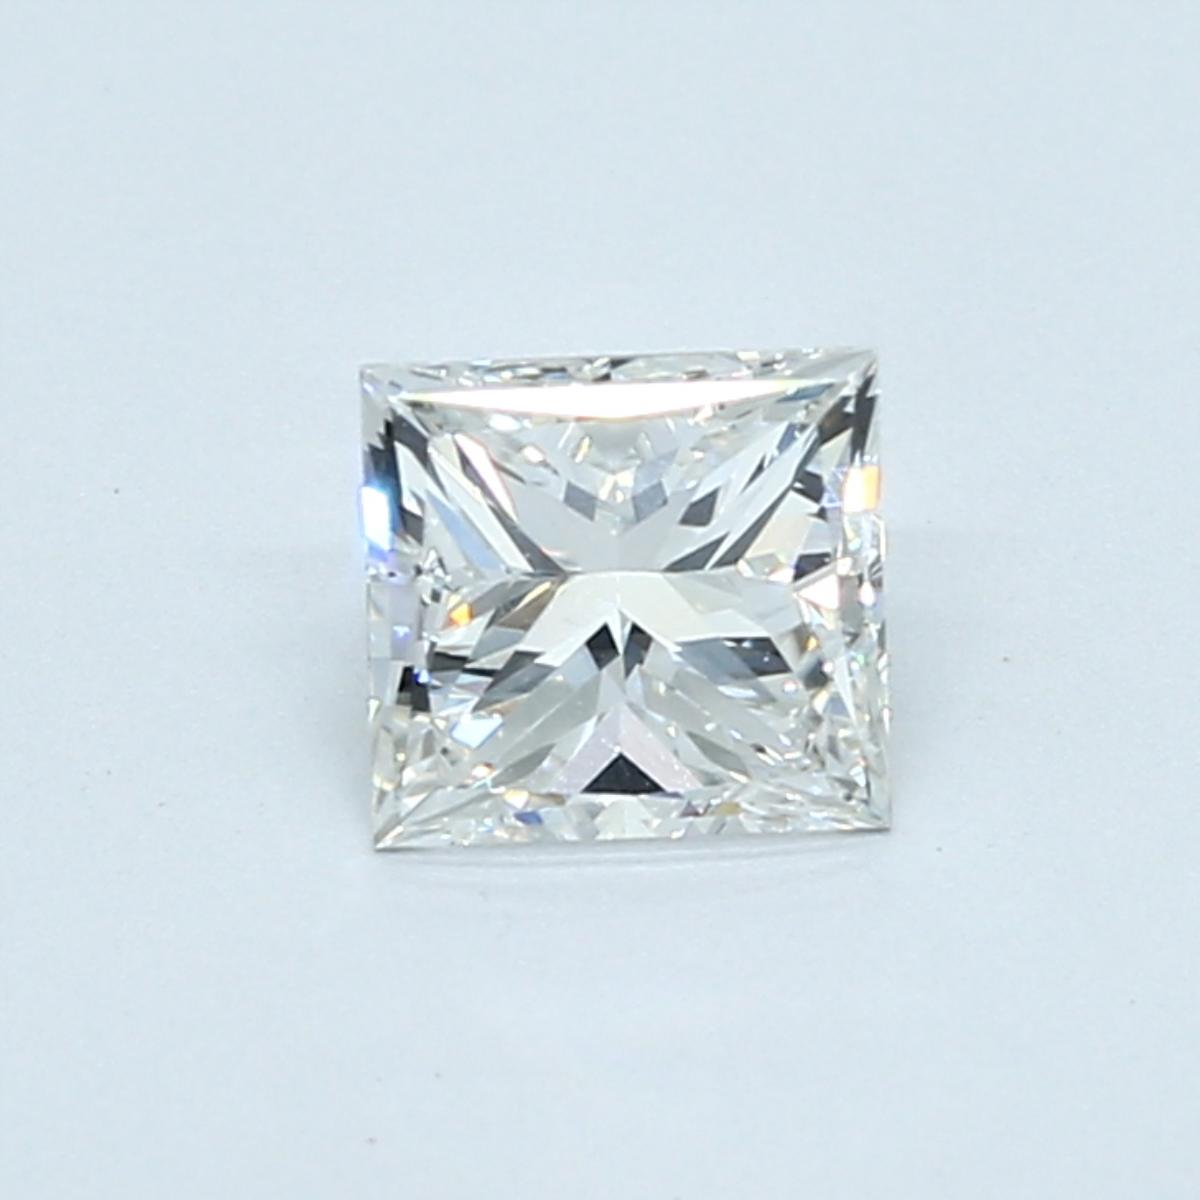 0.8 PR Diamond (F, VVS2)